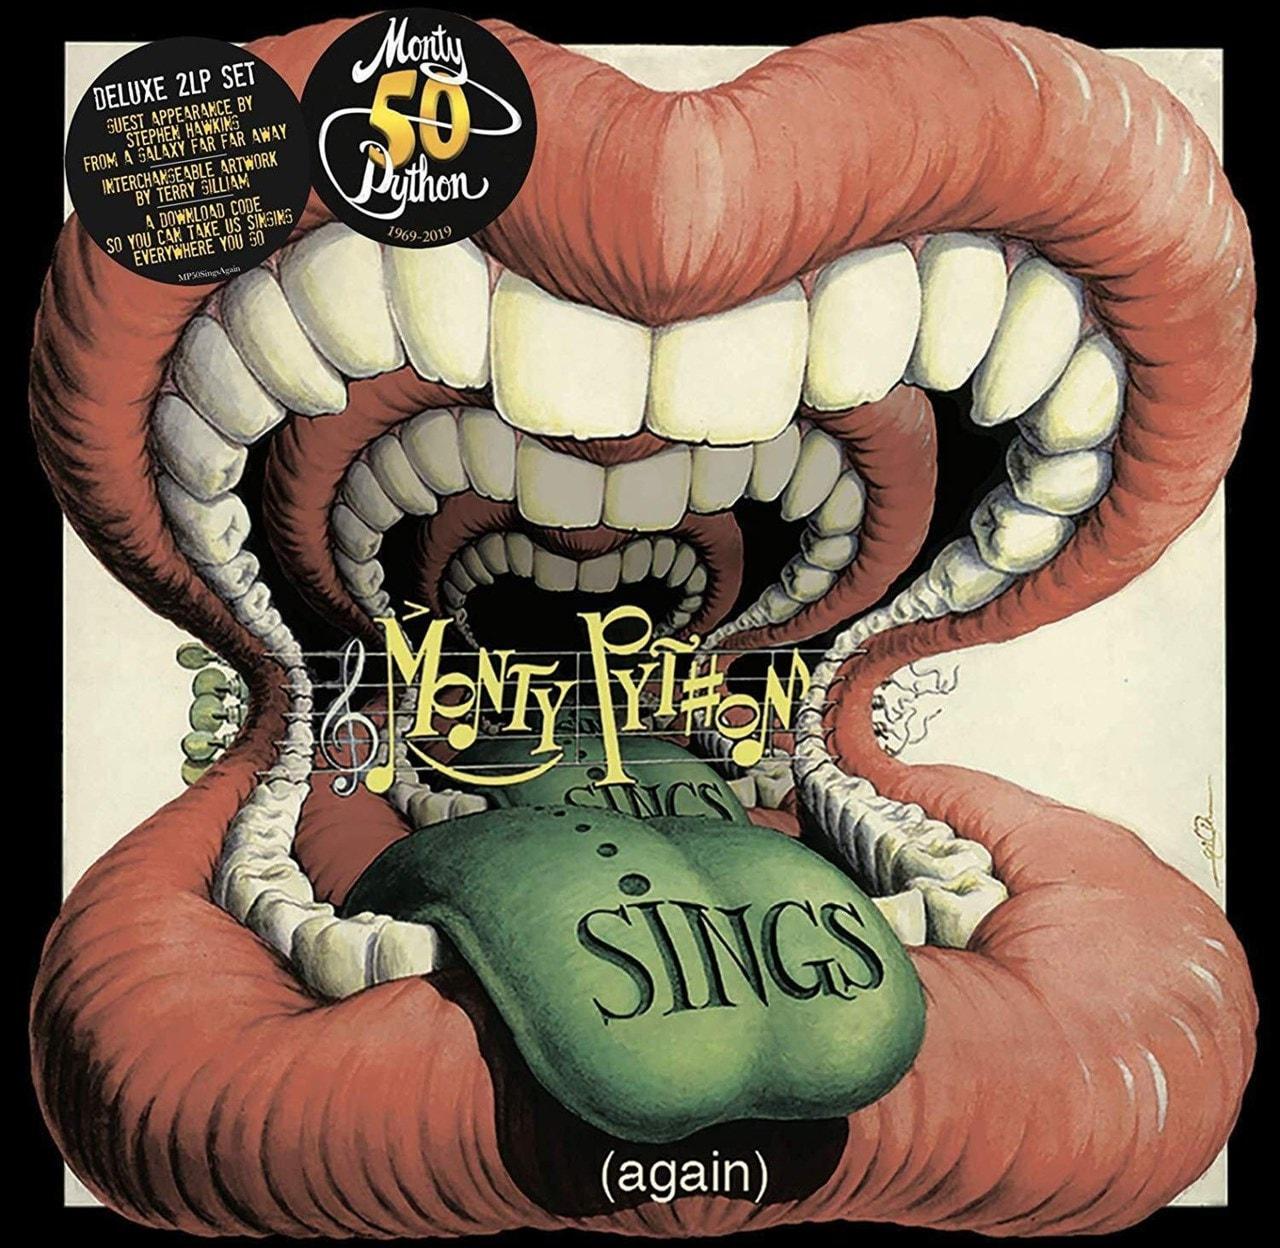 Monty Python Sings (Again) - 1